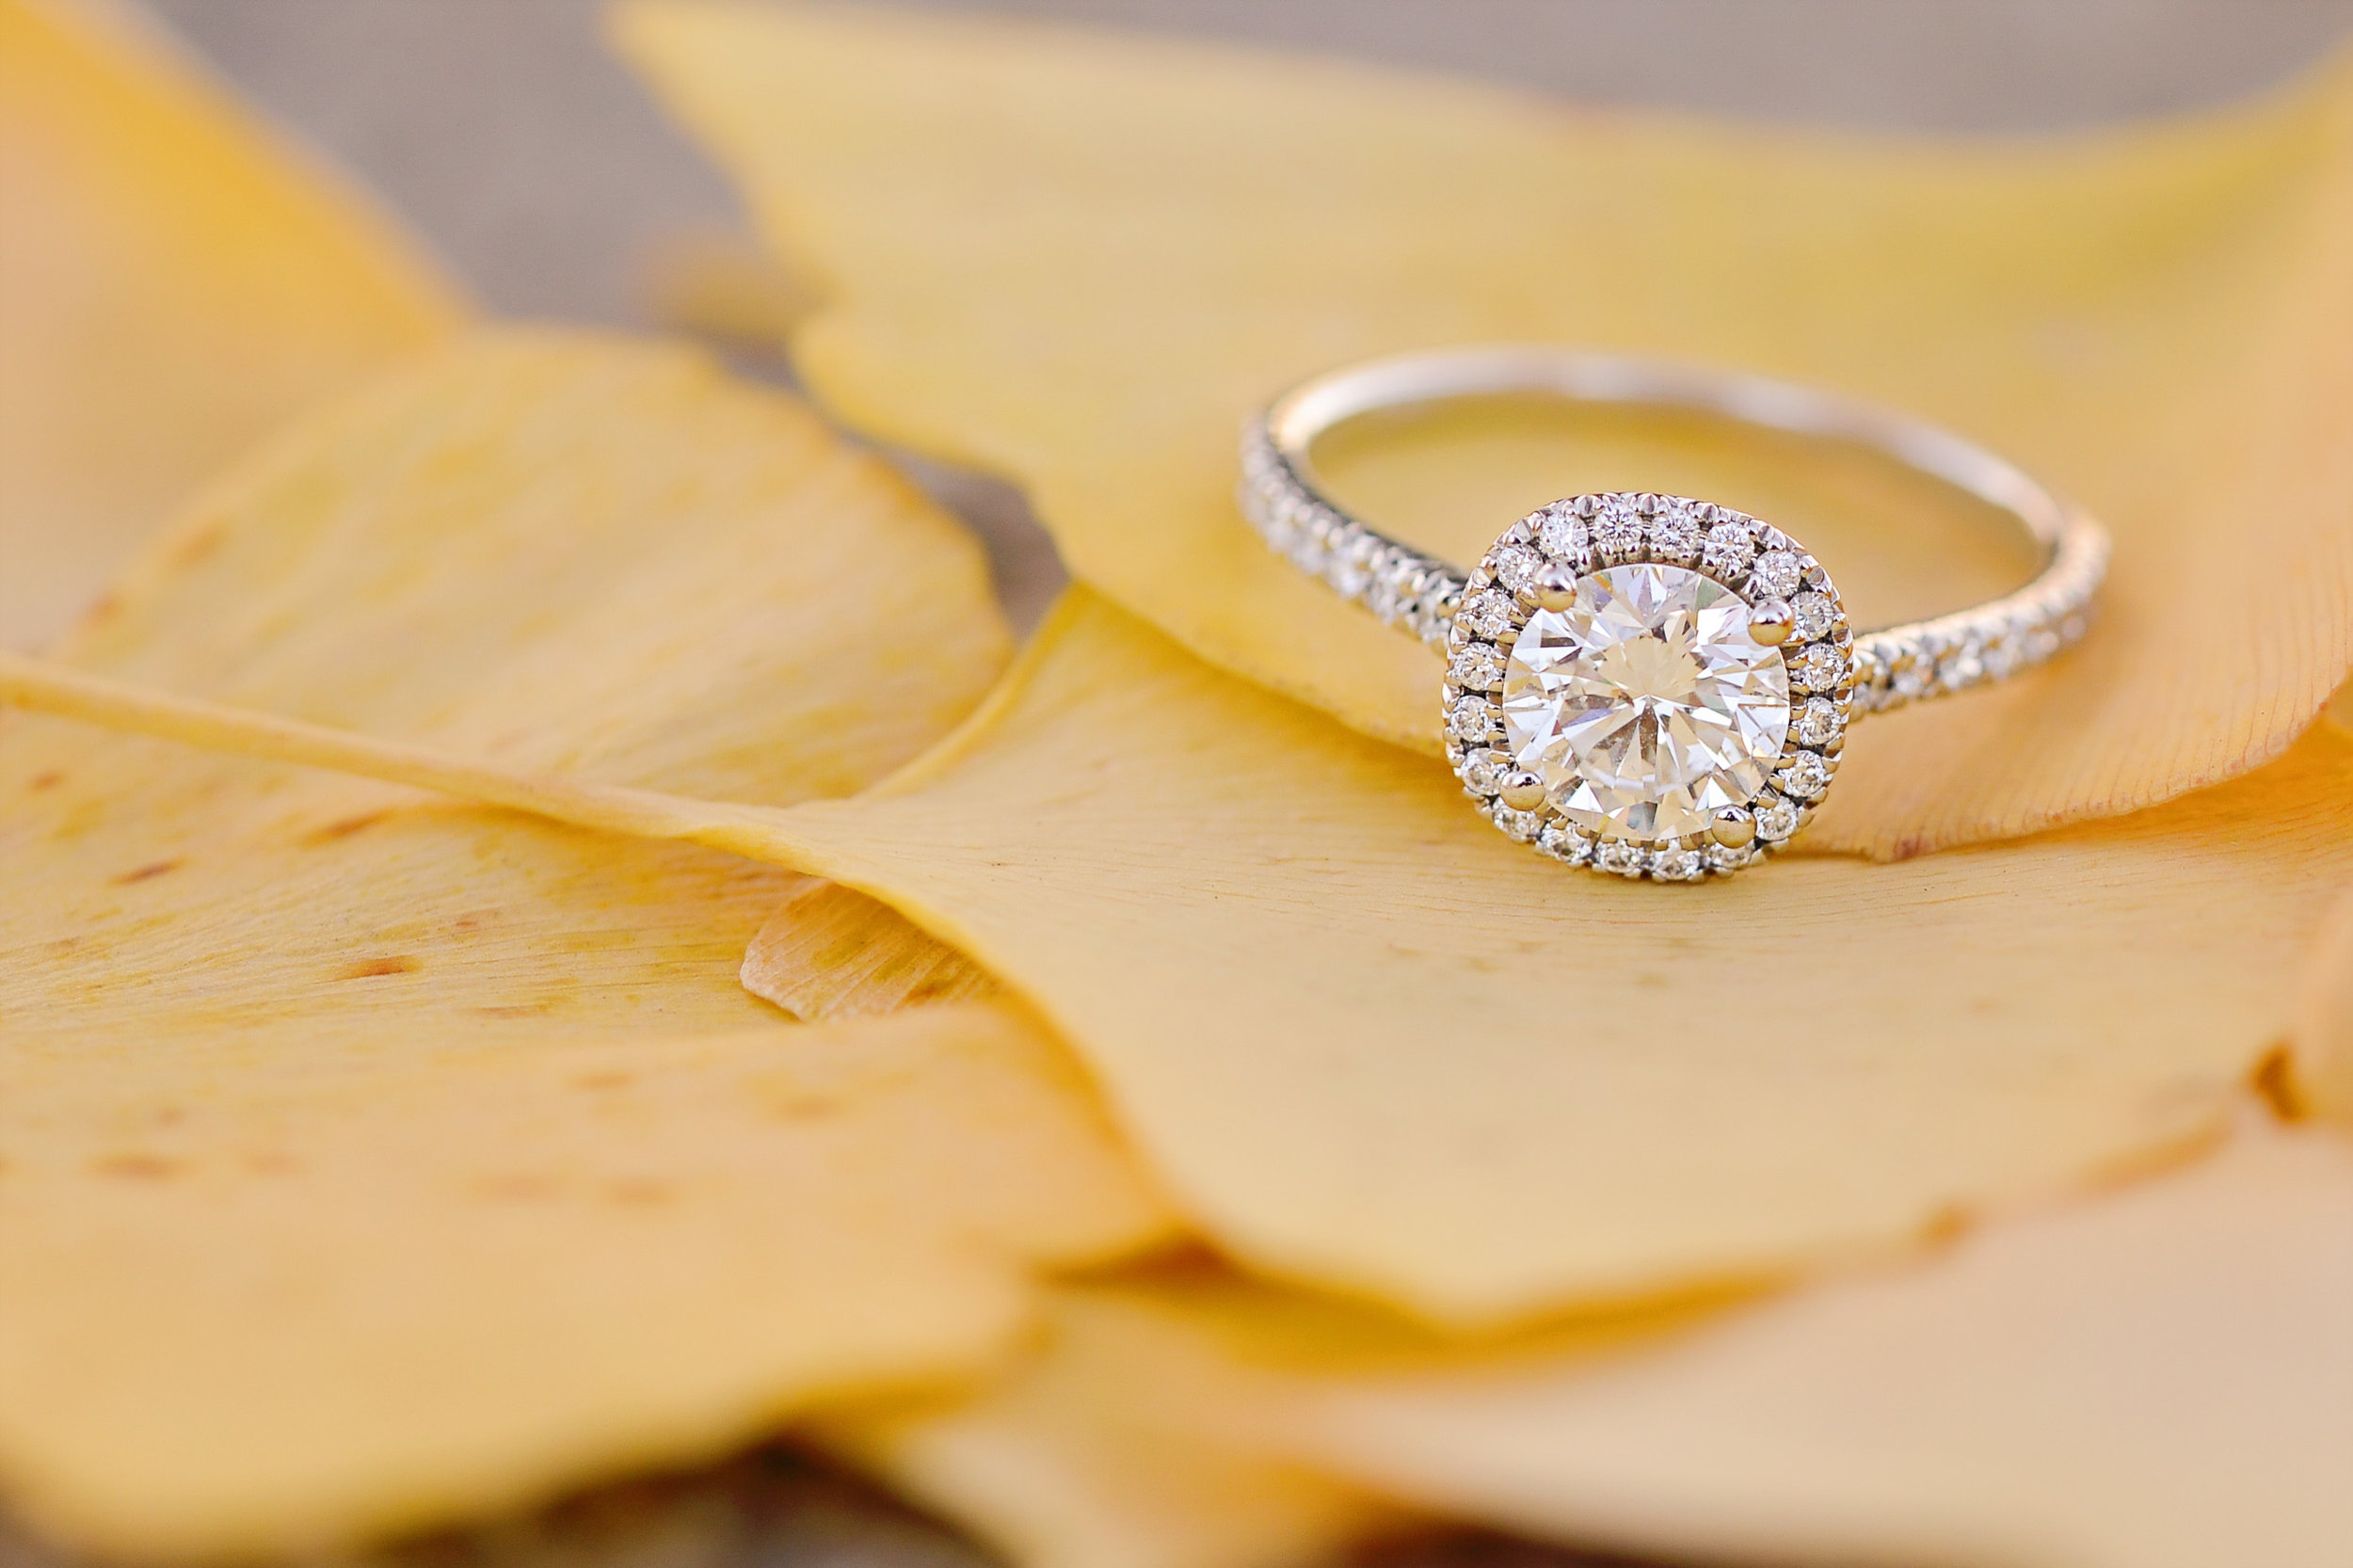 diamond engagement ring on yellow leaves in houston texas photo.jpeg